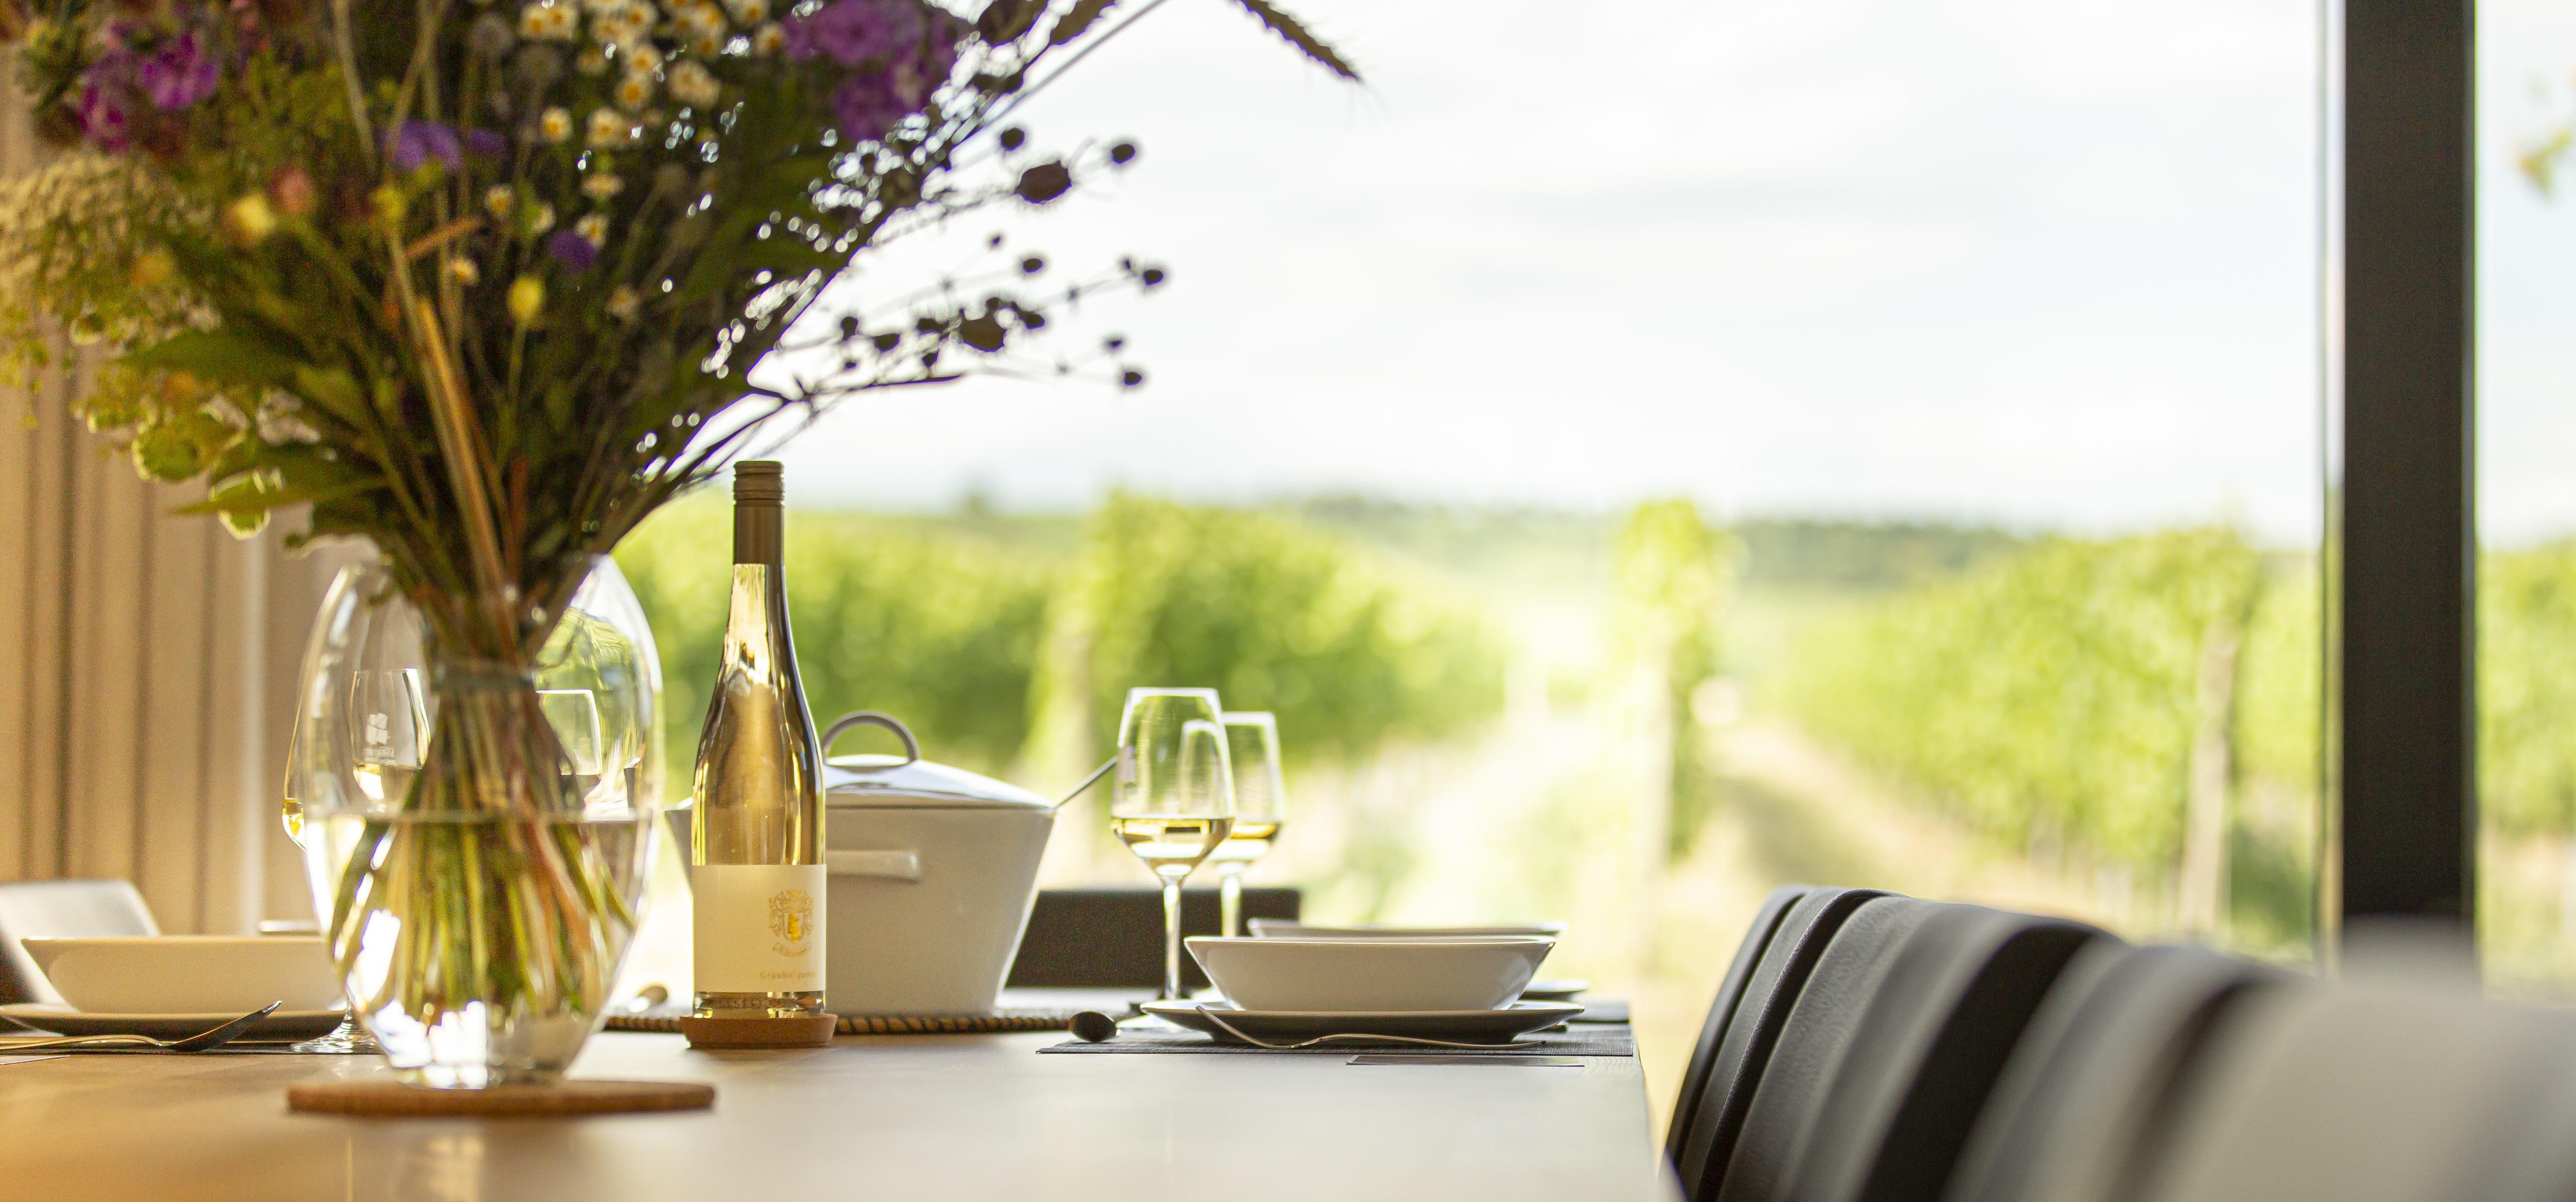 Weingut Schottenhof